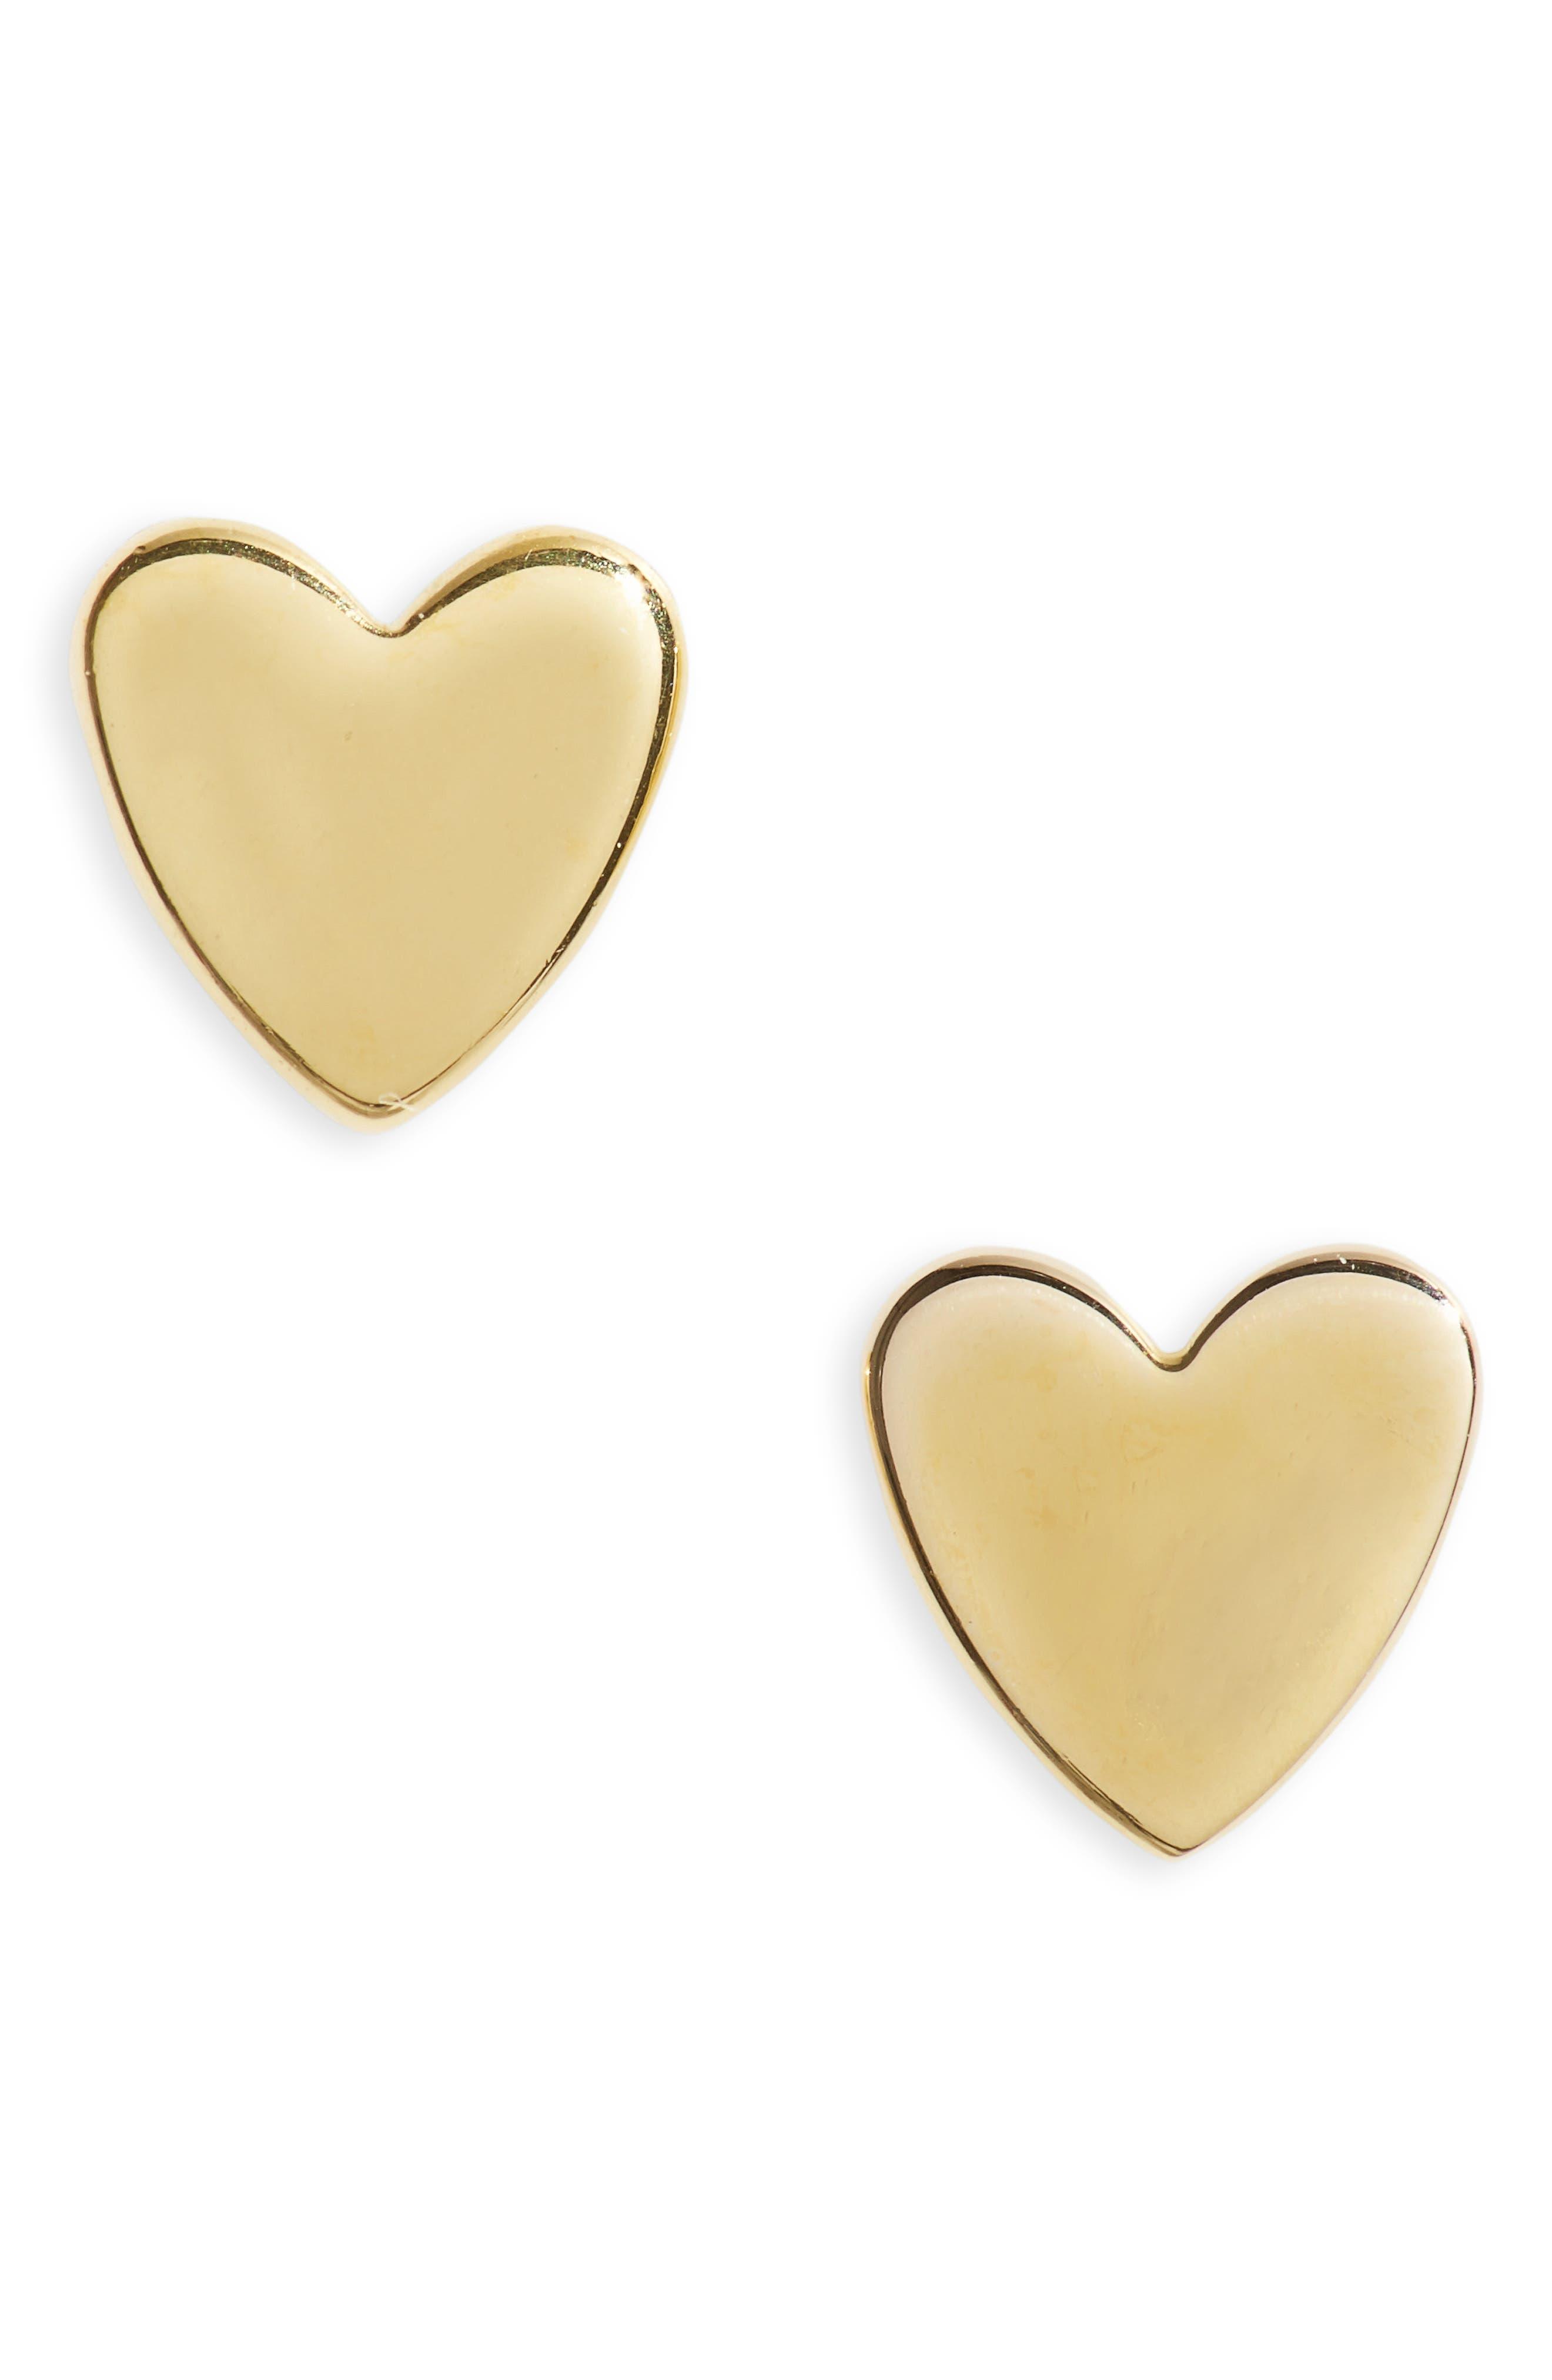 Vermeil Heart Stud Earrings